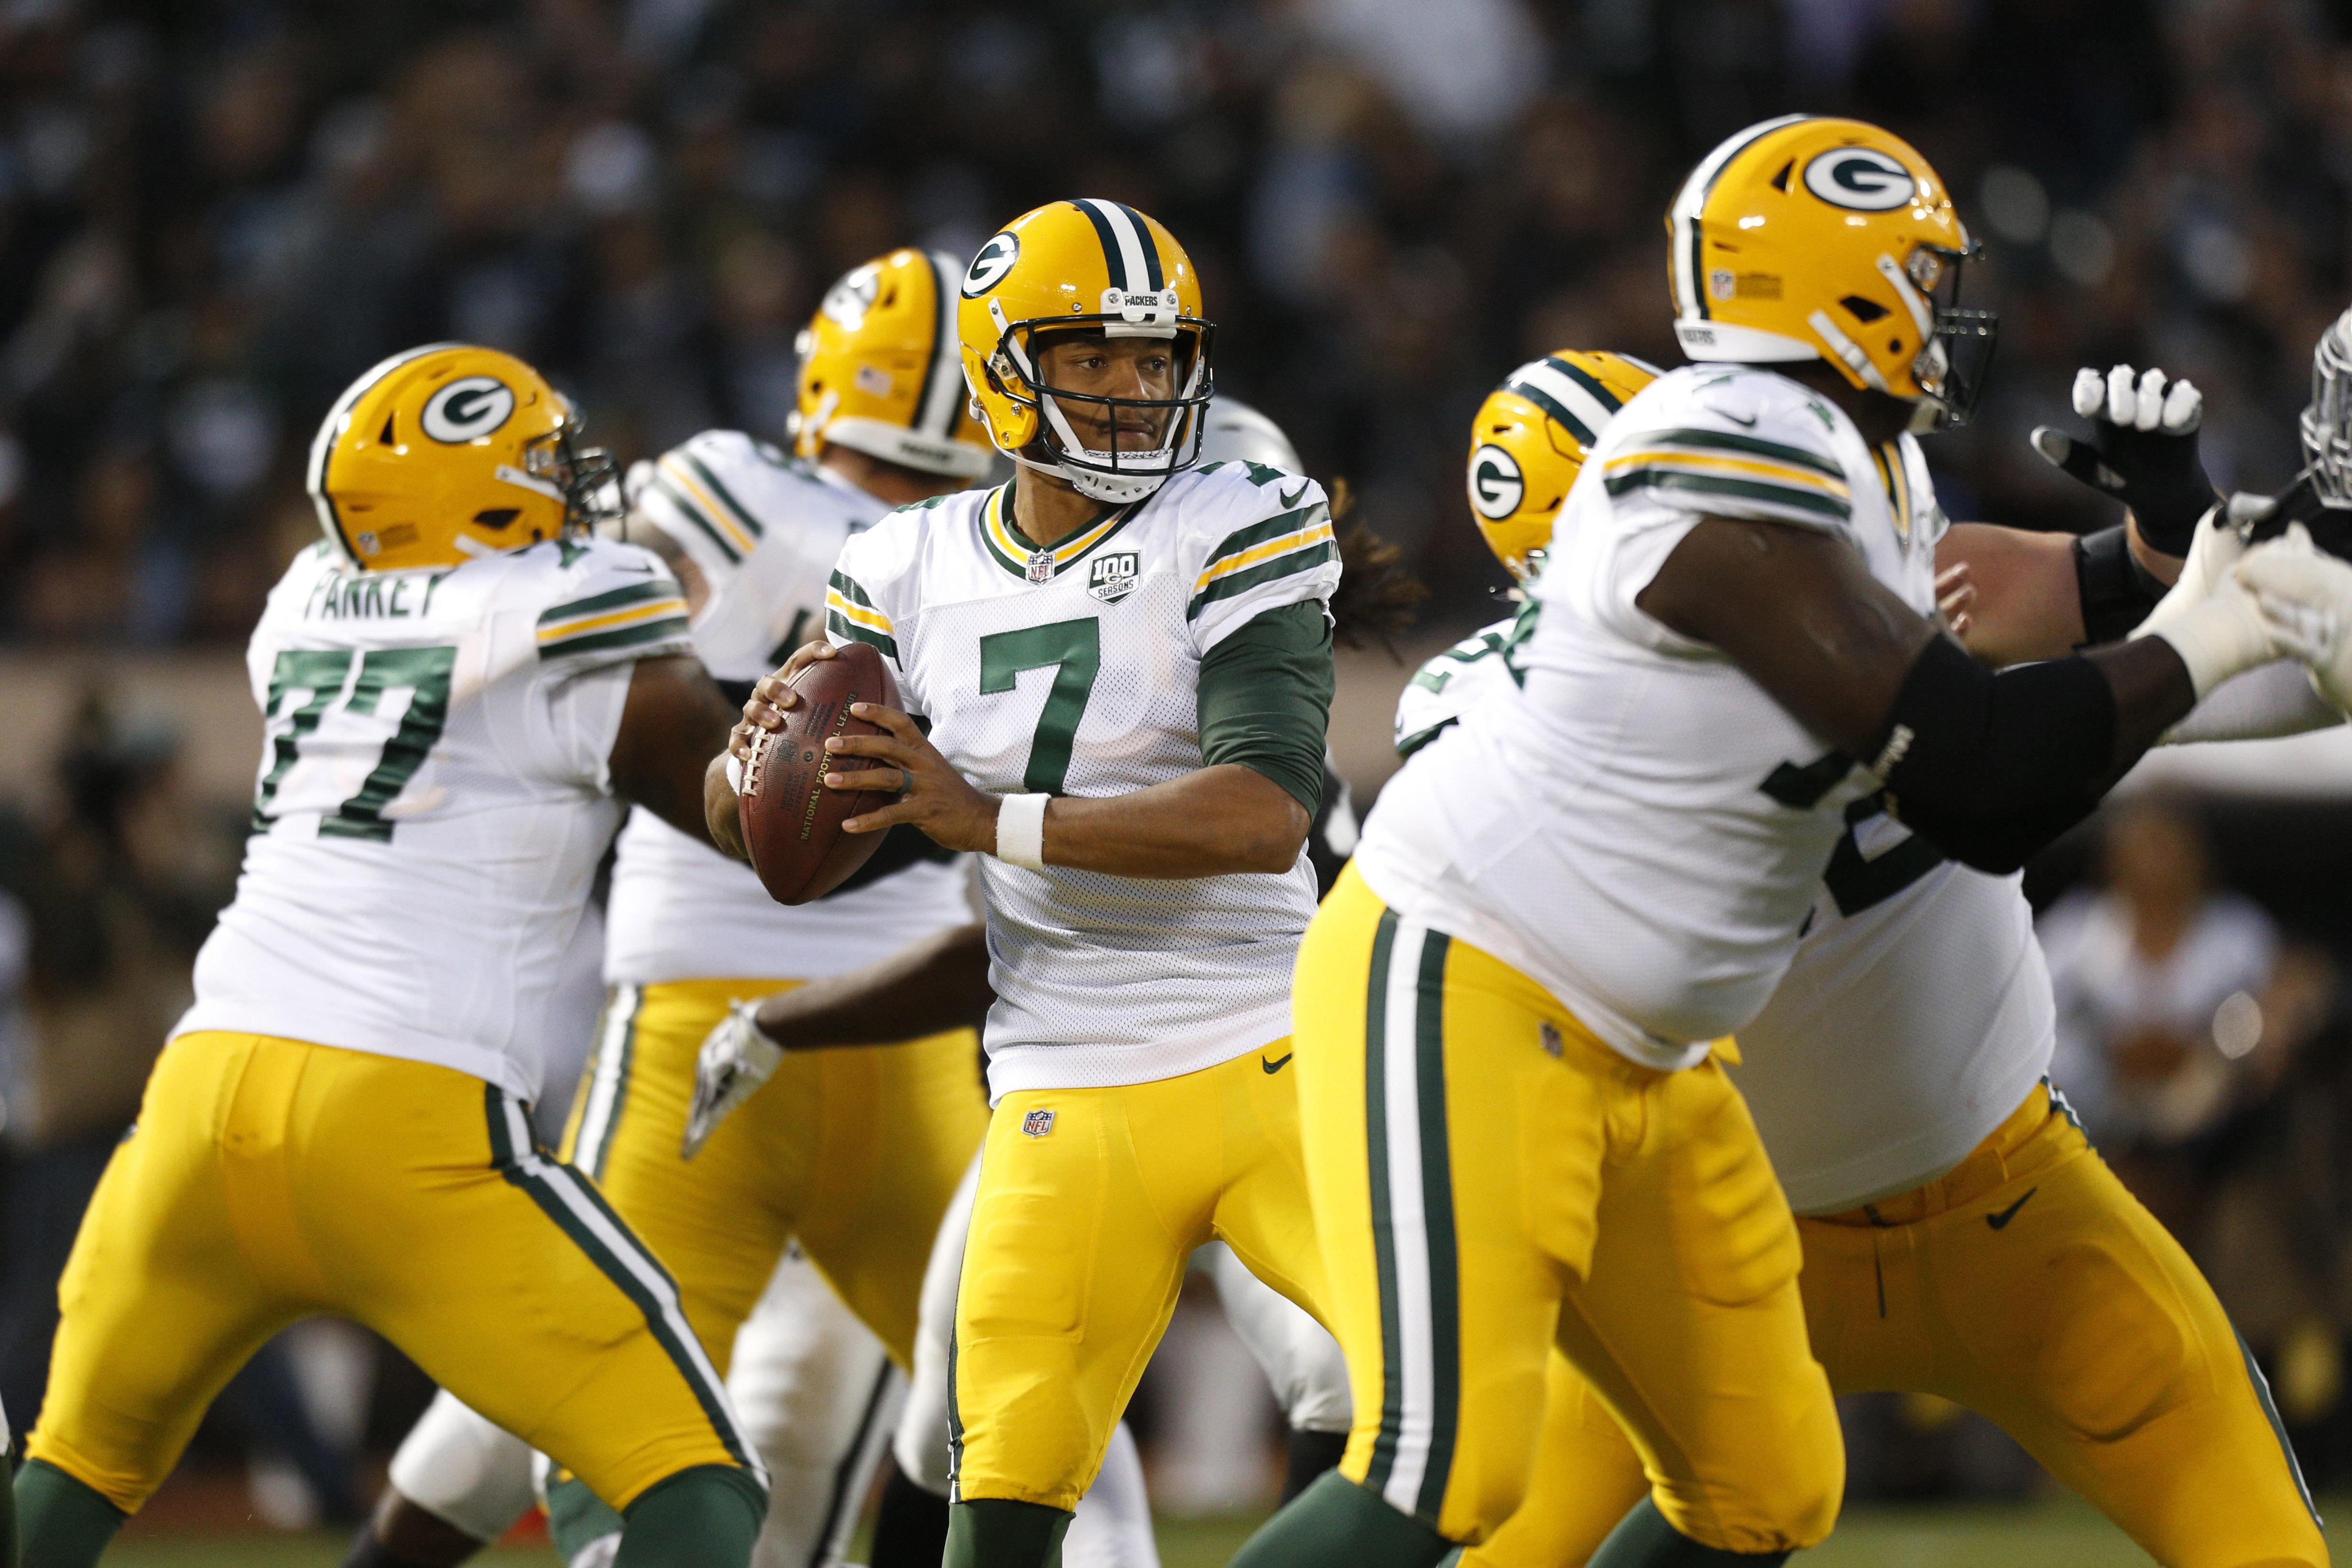 NFL: Green Bay Packers at Oakland Raiders